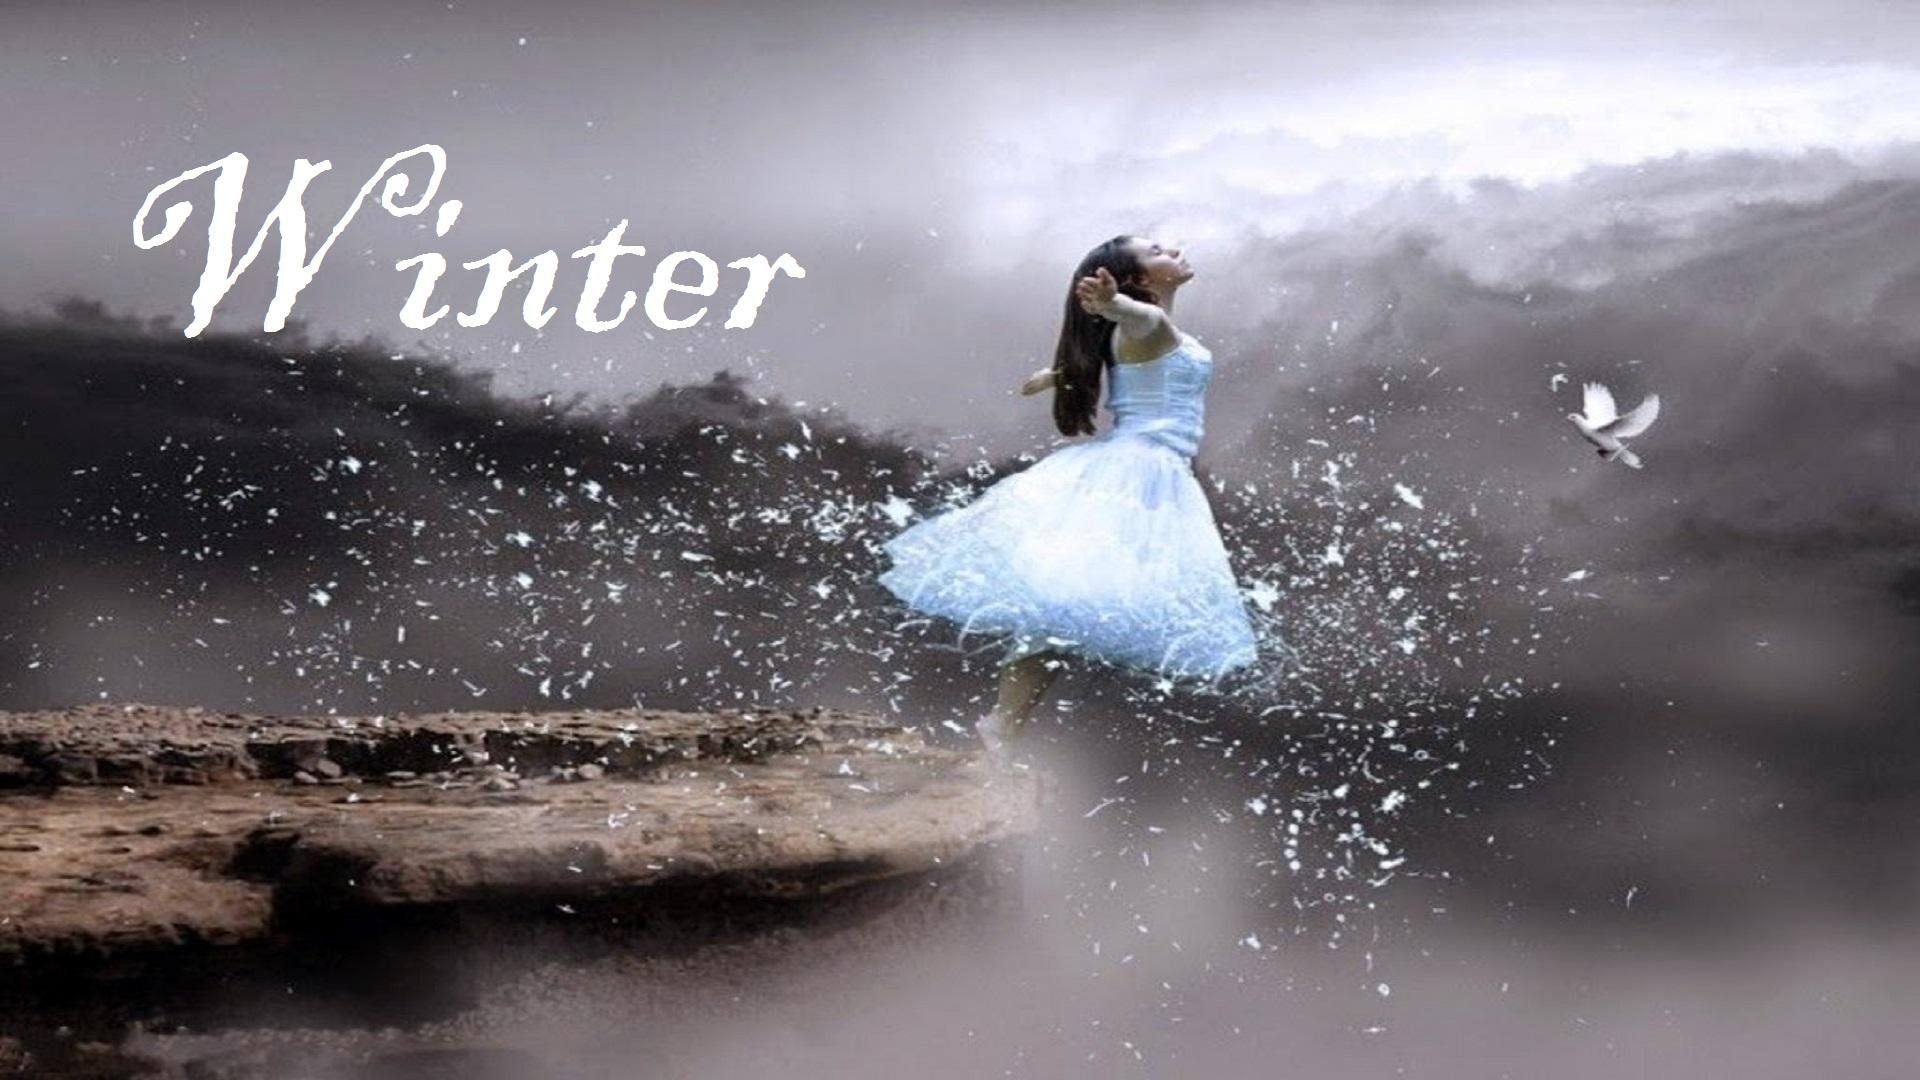 Amazing Art of Snow Falling free hd for desktop wallpapers